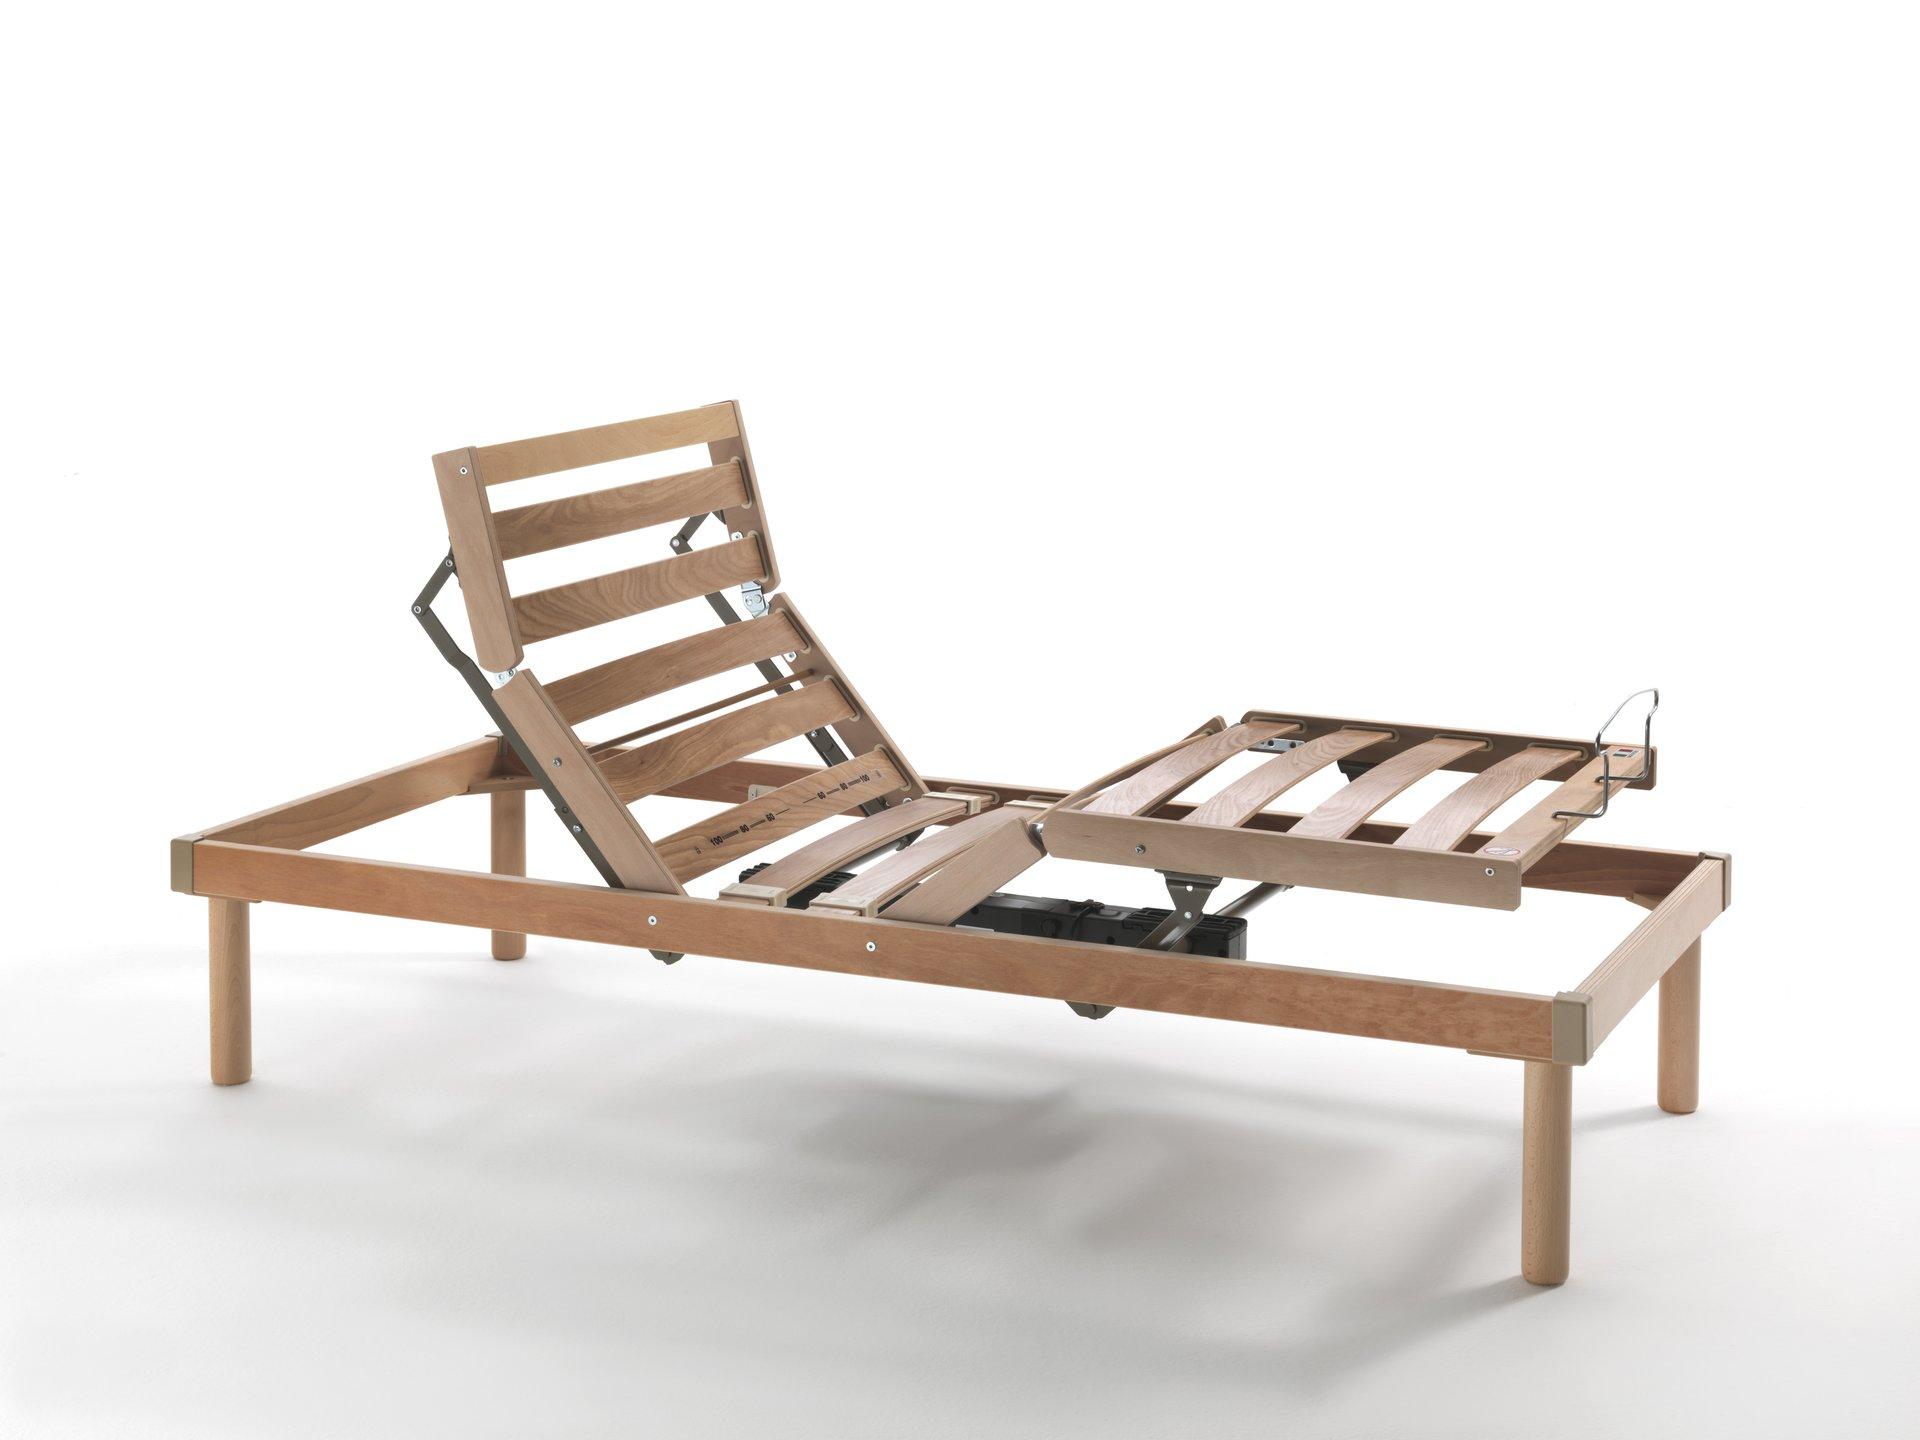 struttura a doghe in legno reclinabile